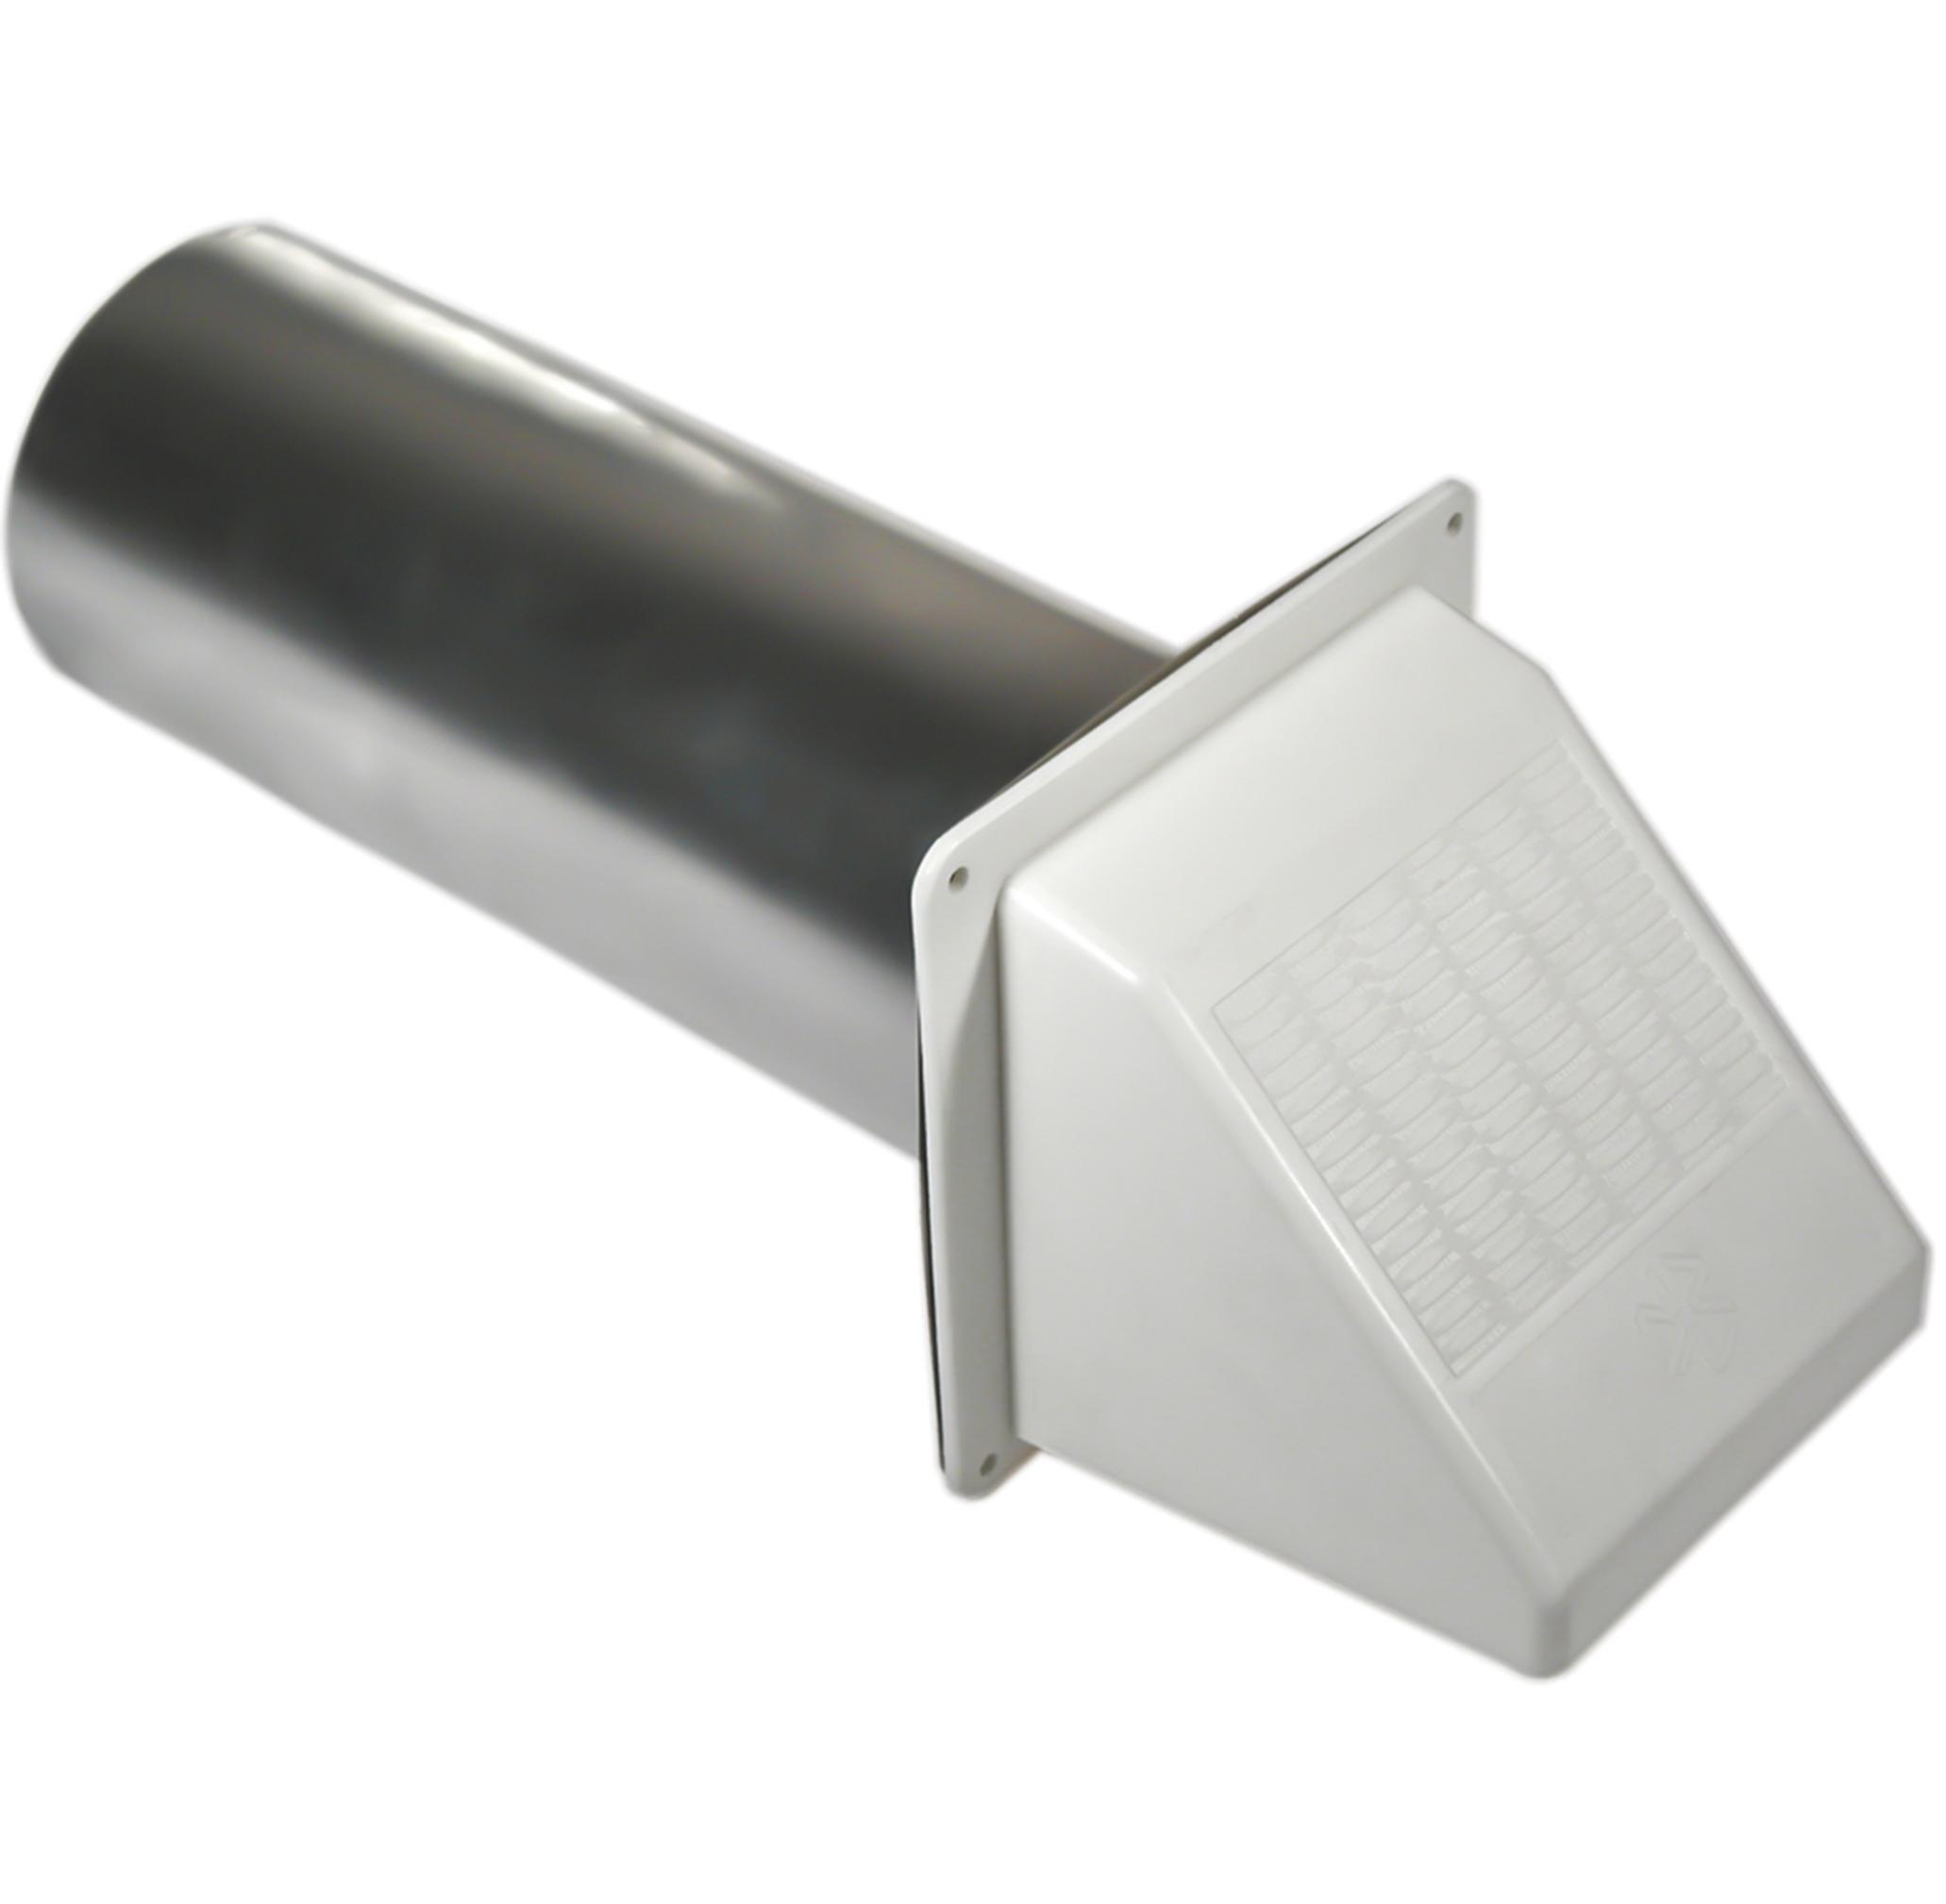 All Metal Dryer Vent Kits With Hoods Builder S Best